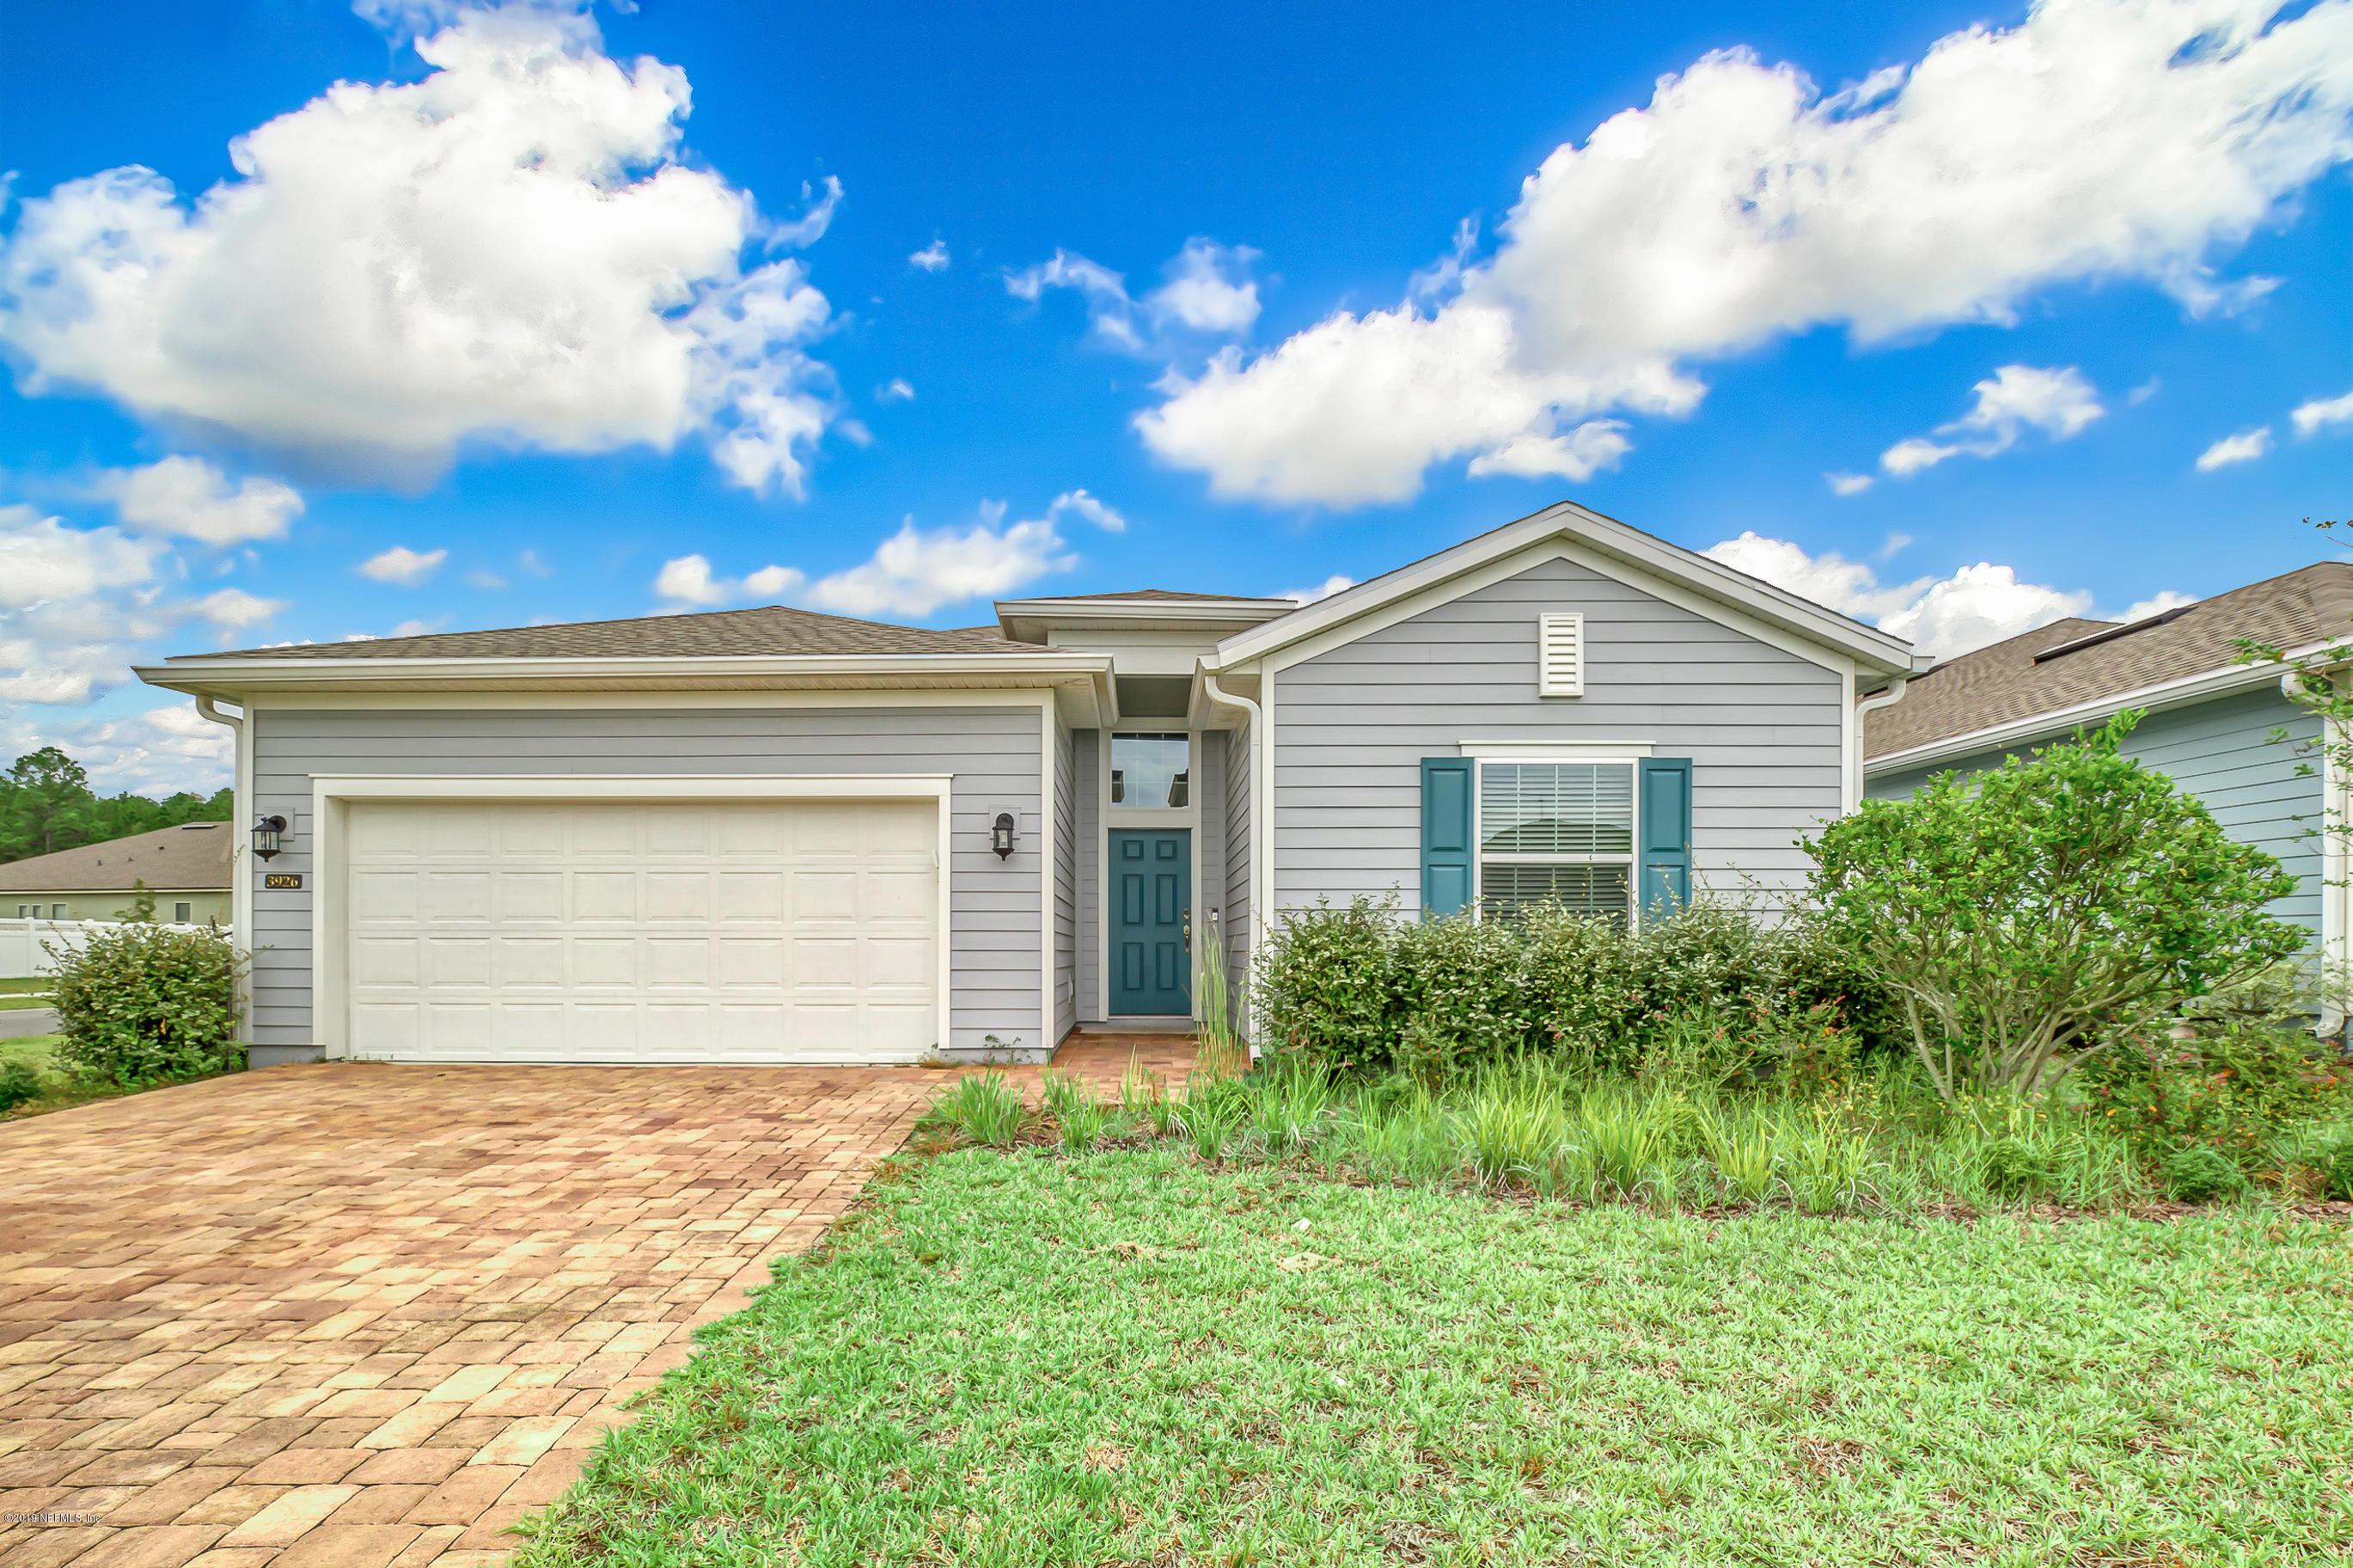 3926 ARBOR MILL, ORANGE PARK, FLORIDA 32065, 4 Bedrooms Bedrooms, ,3 BathroomsBathrooms,Residential - single family,For sale,ARBOR MILL,1022249